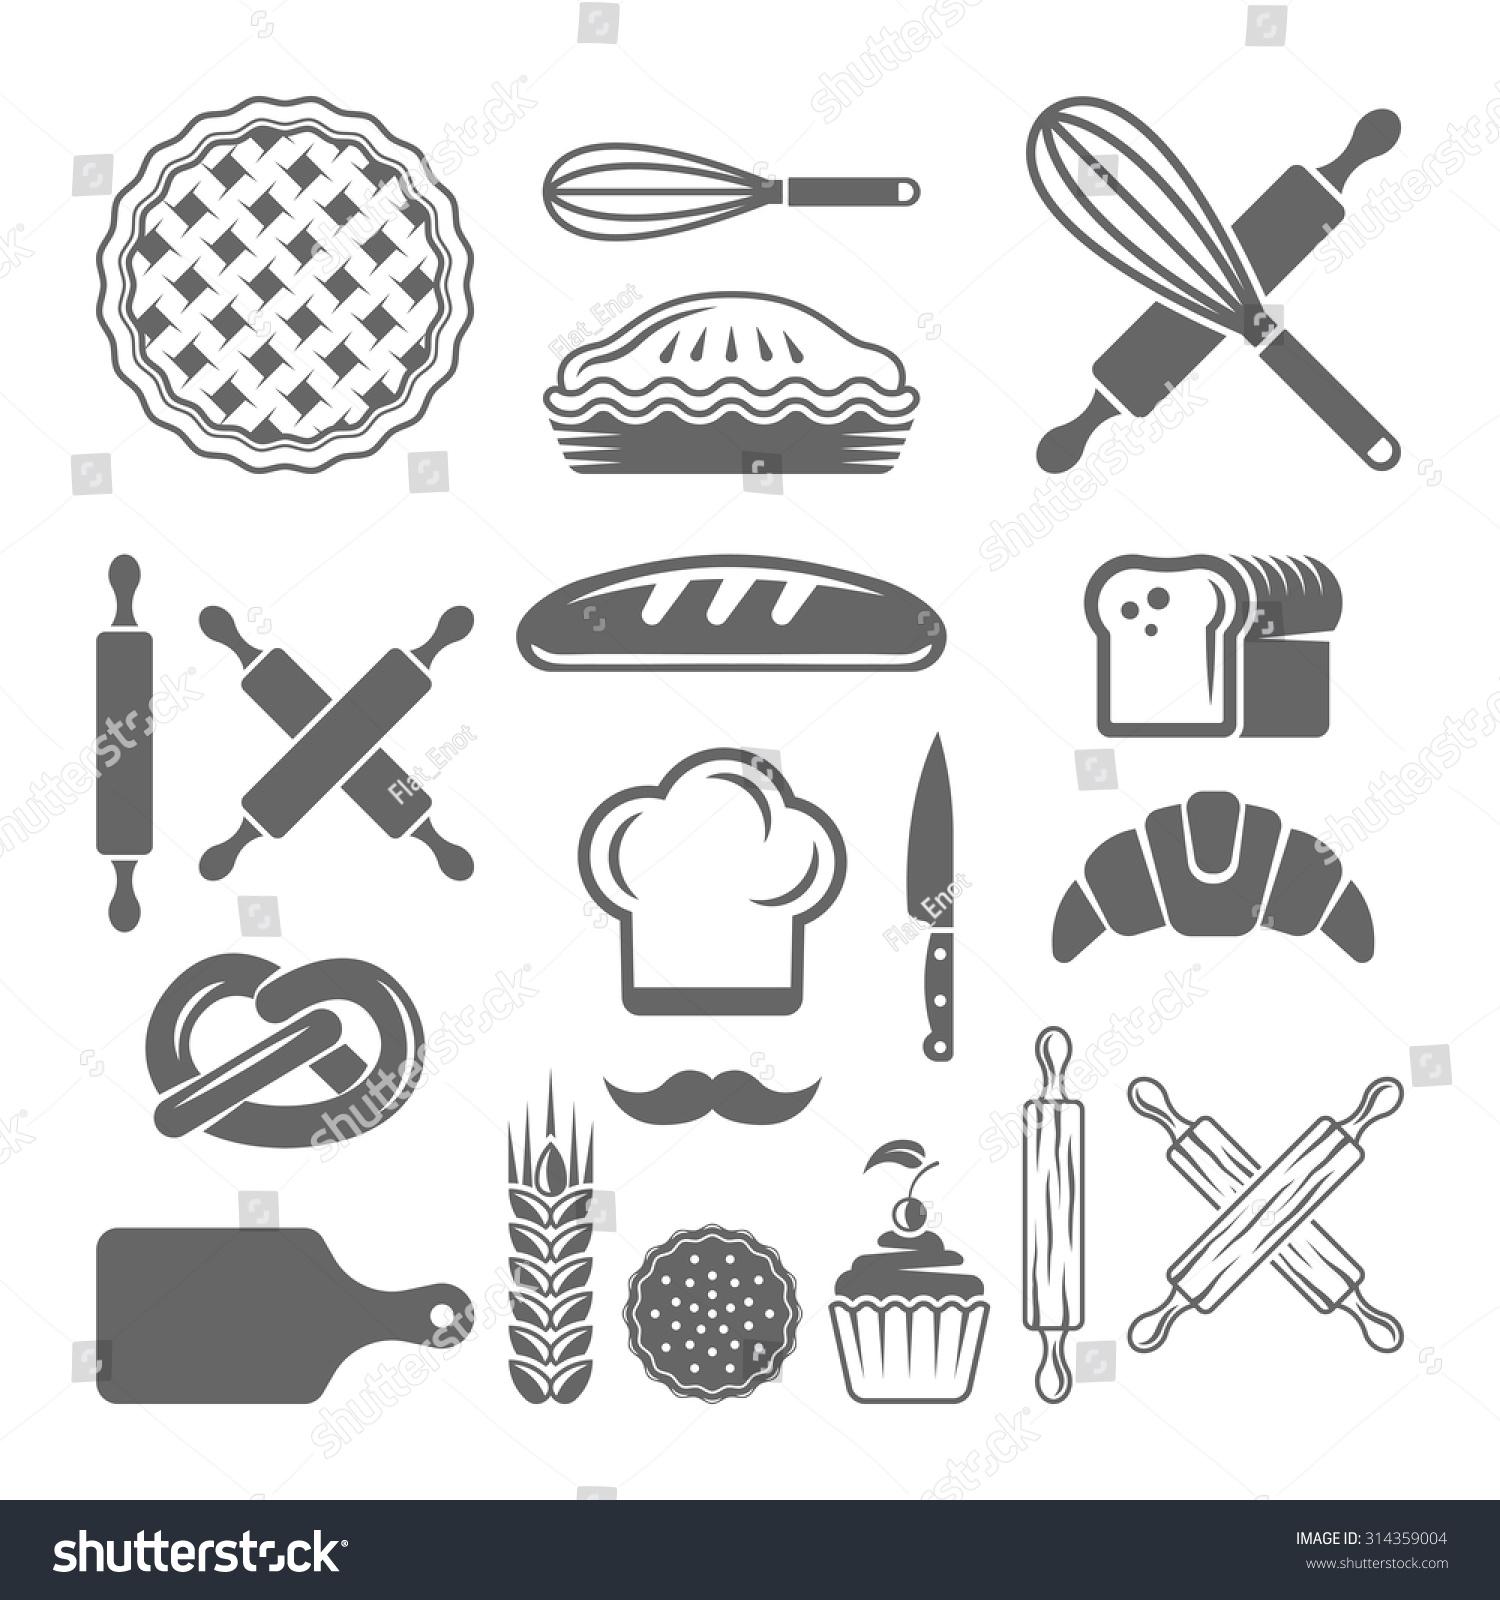 Bakery pastries set vector design elements stock vector for Kitchen design vector